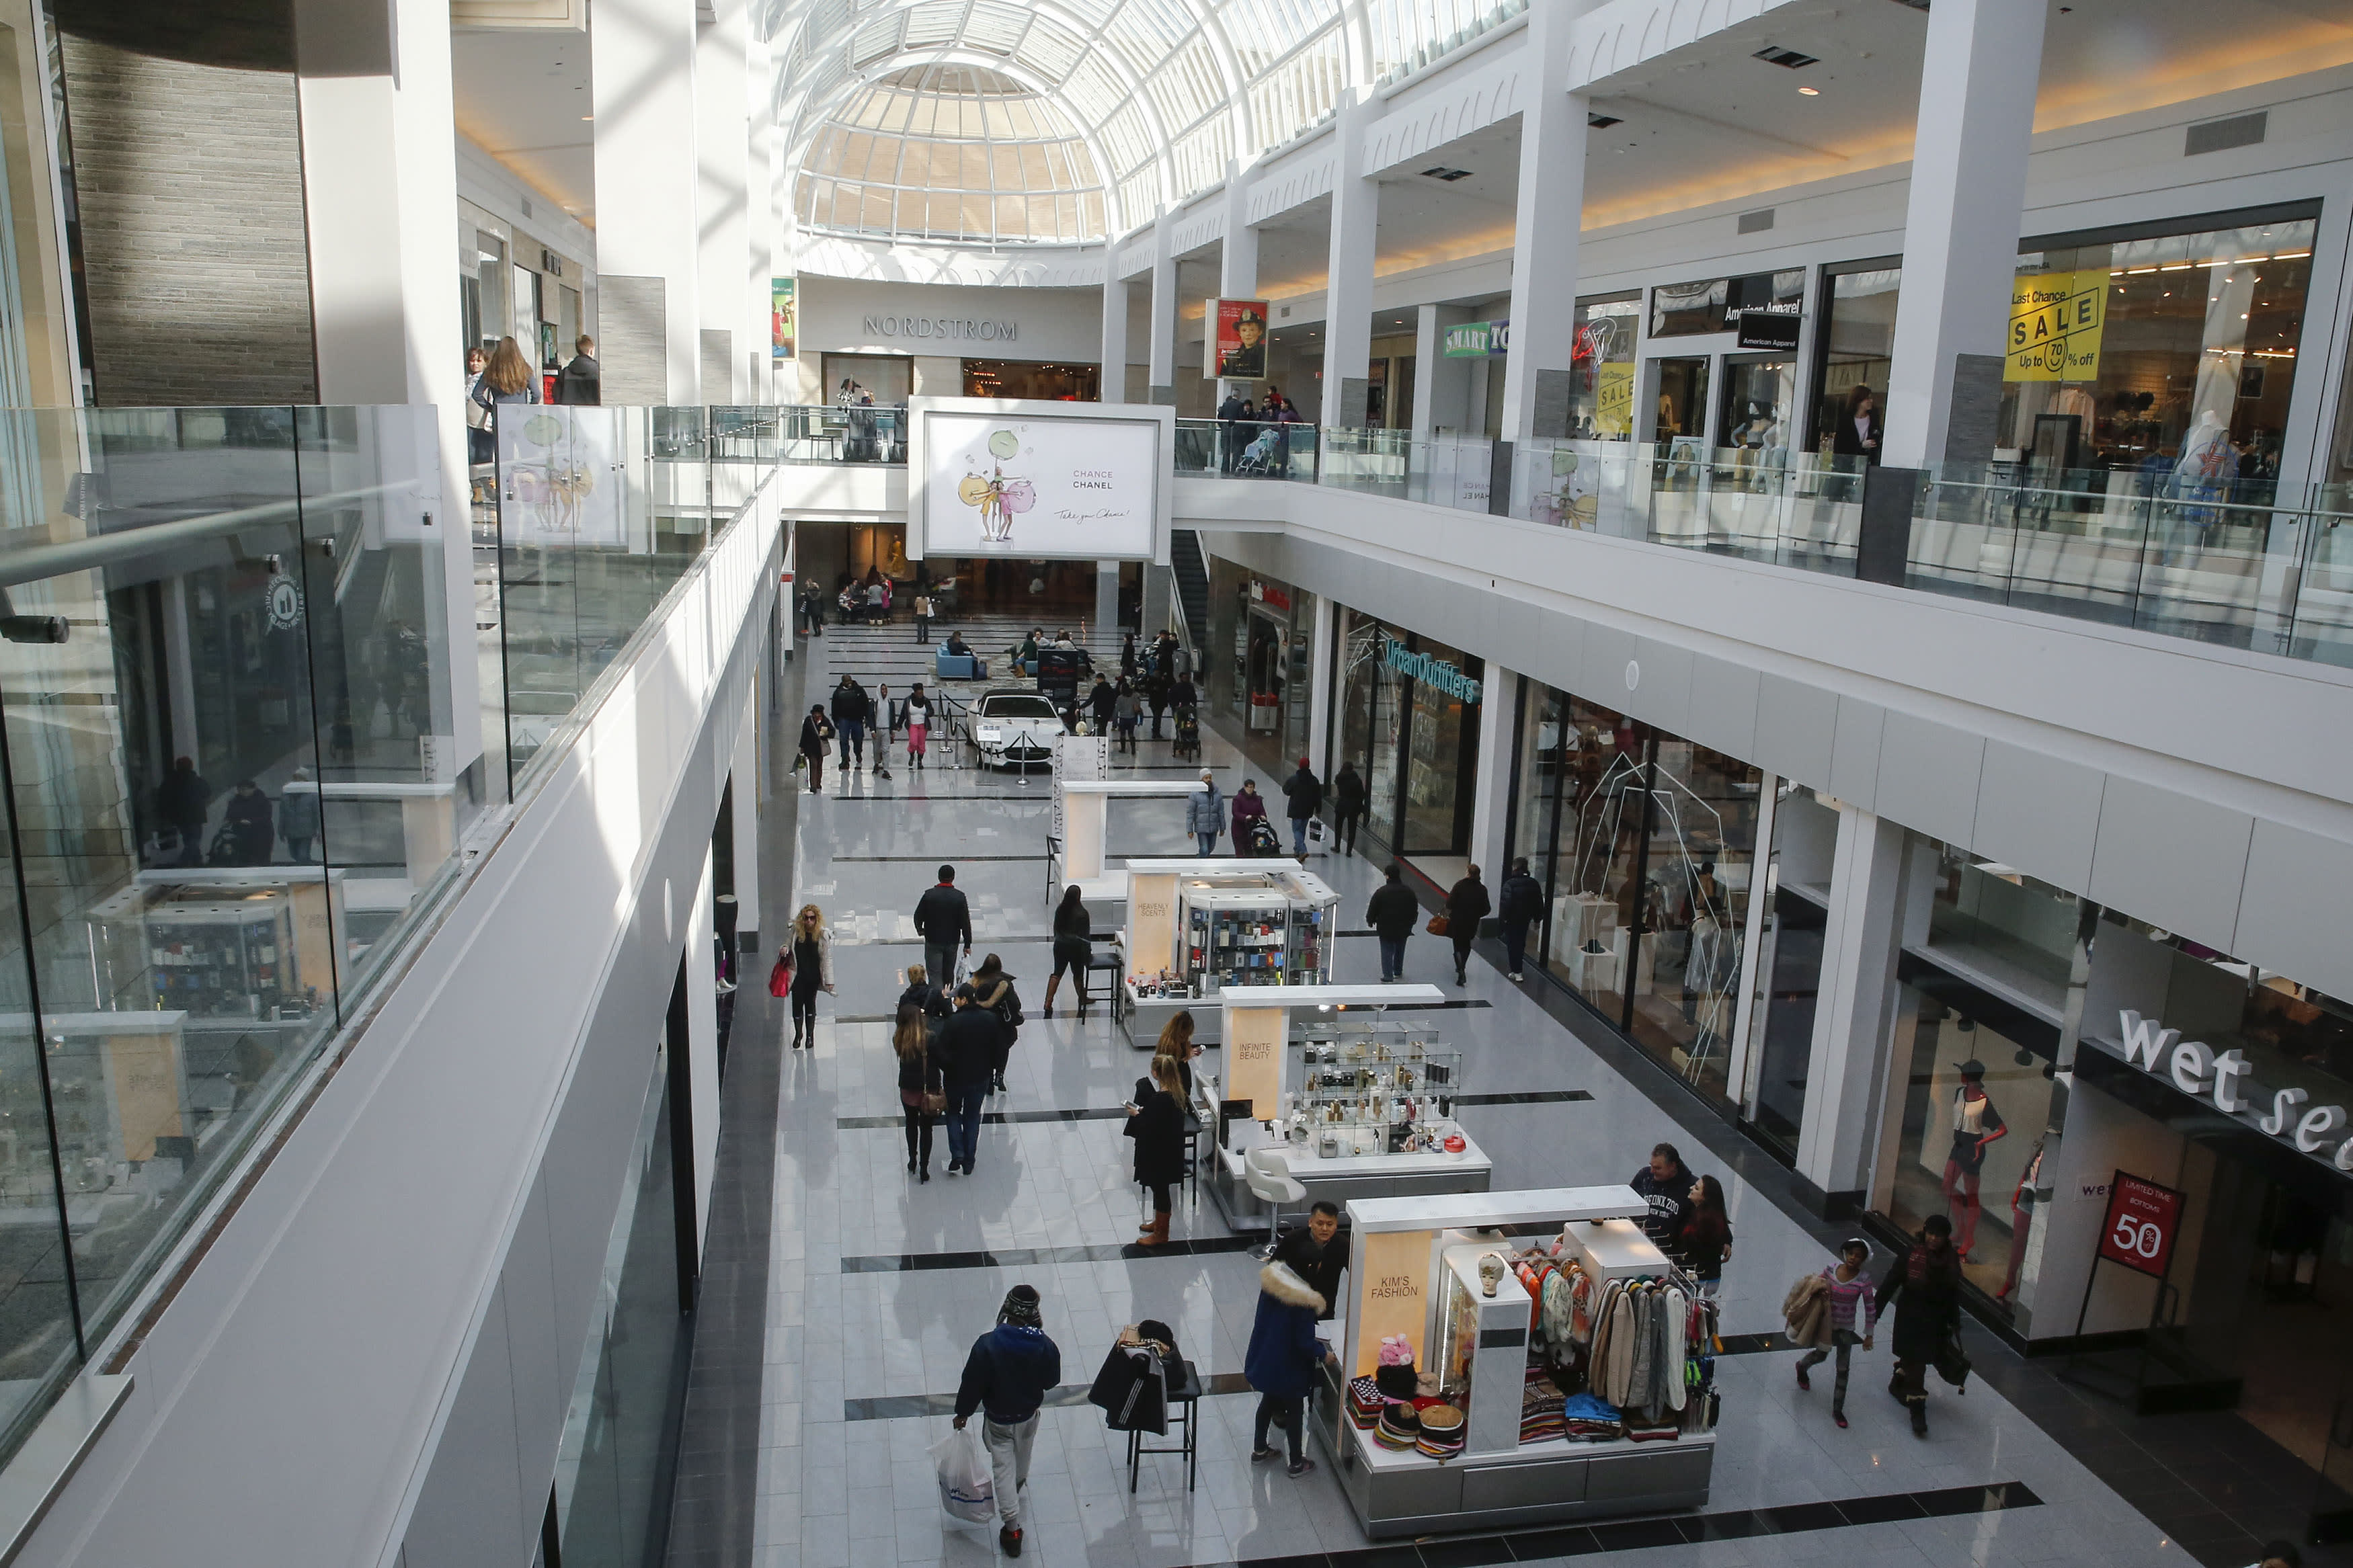 f33638adb85 America s 10 most valuable malls are bringing in billions in sales